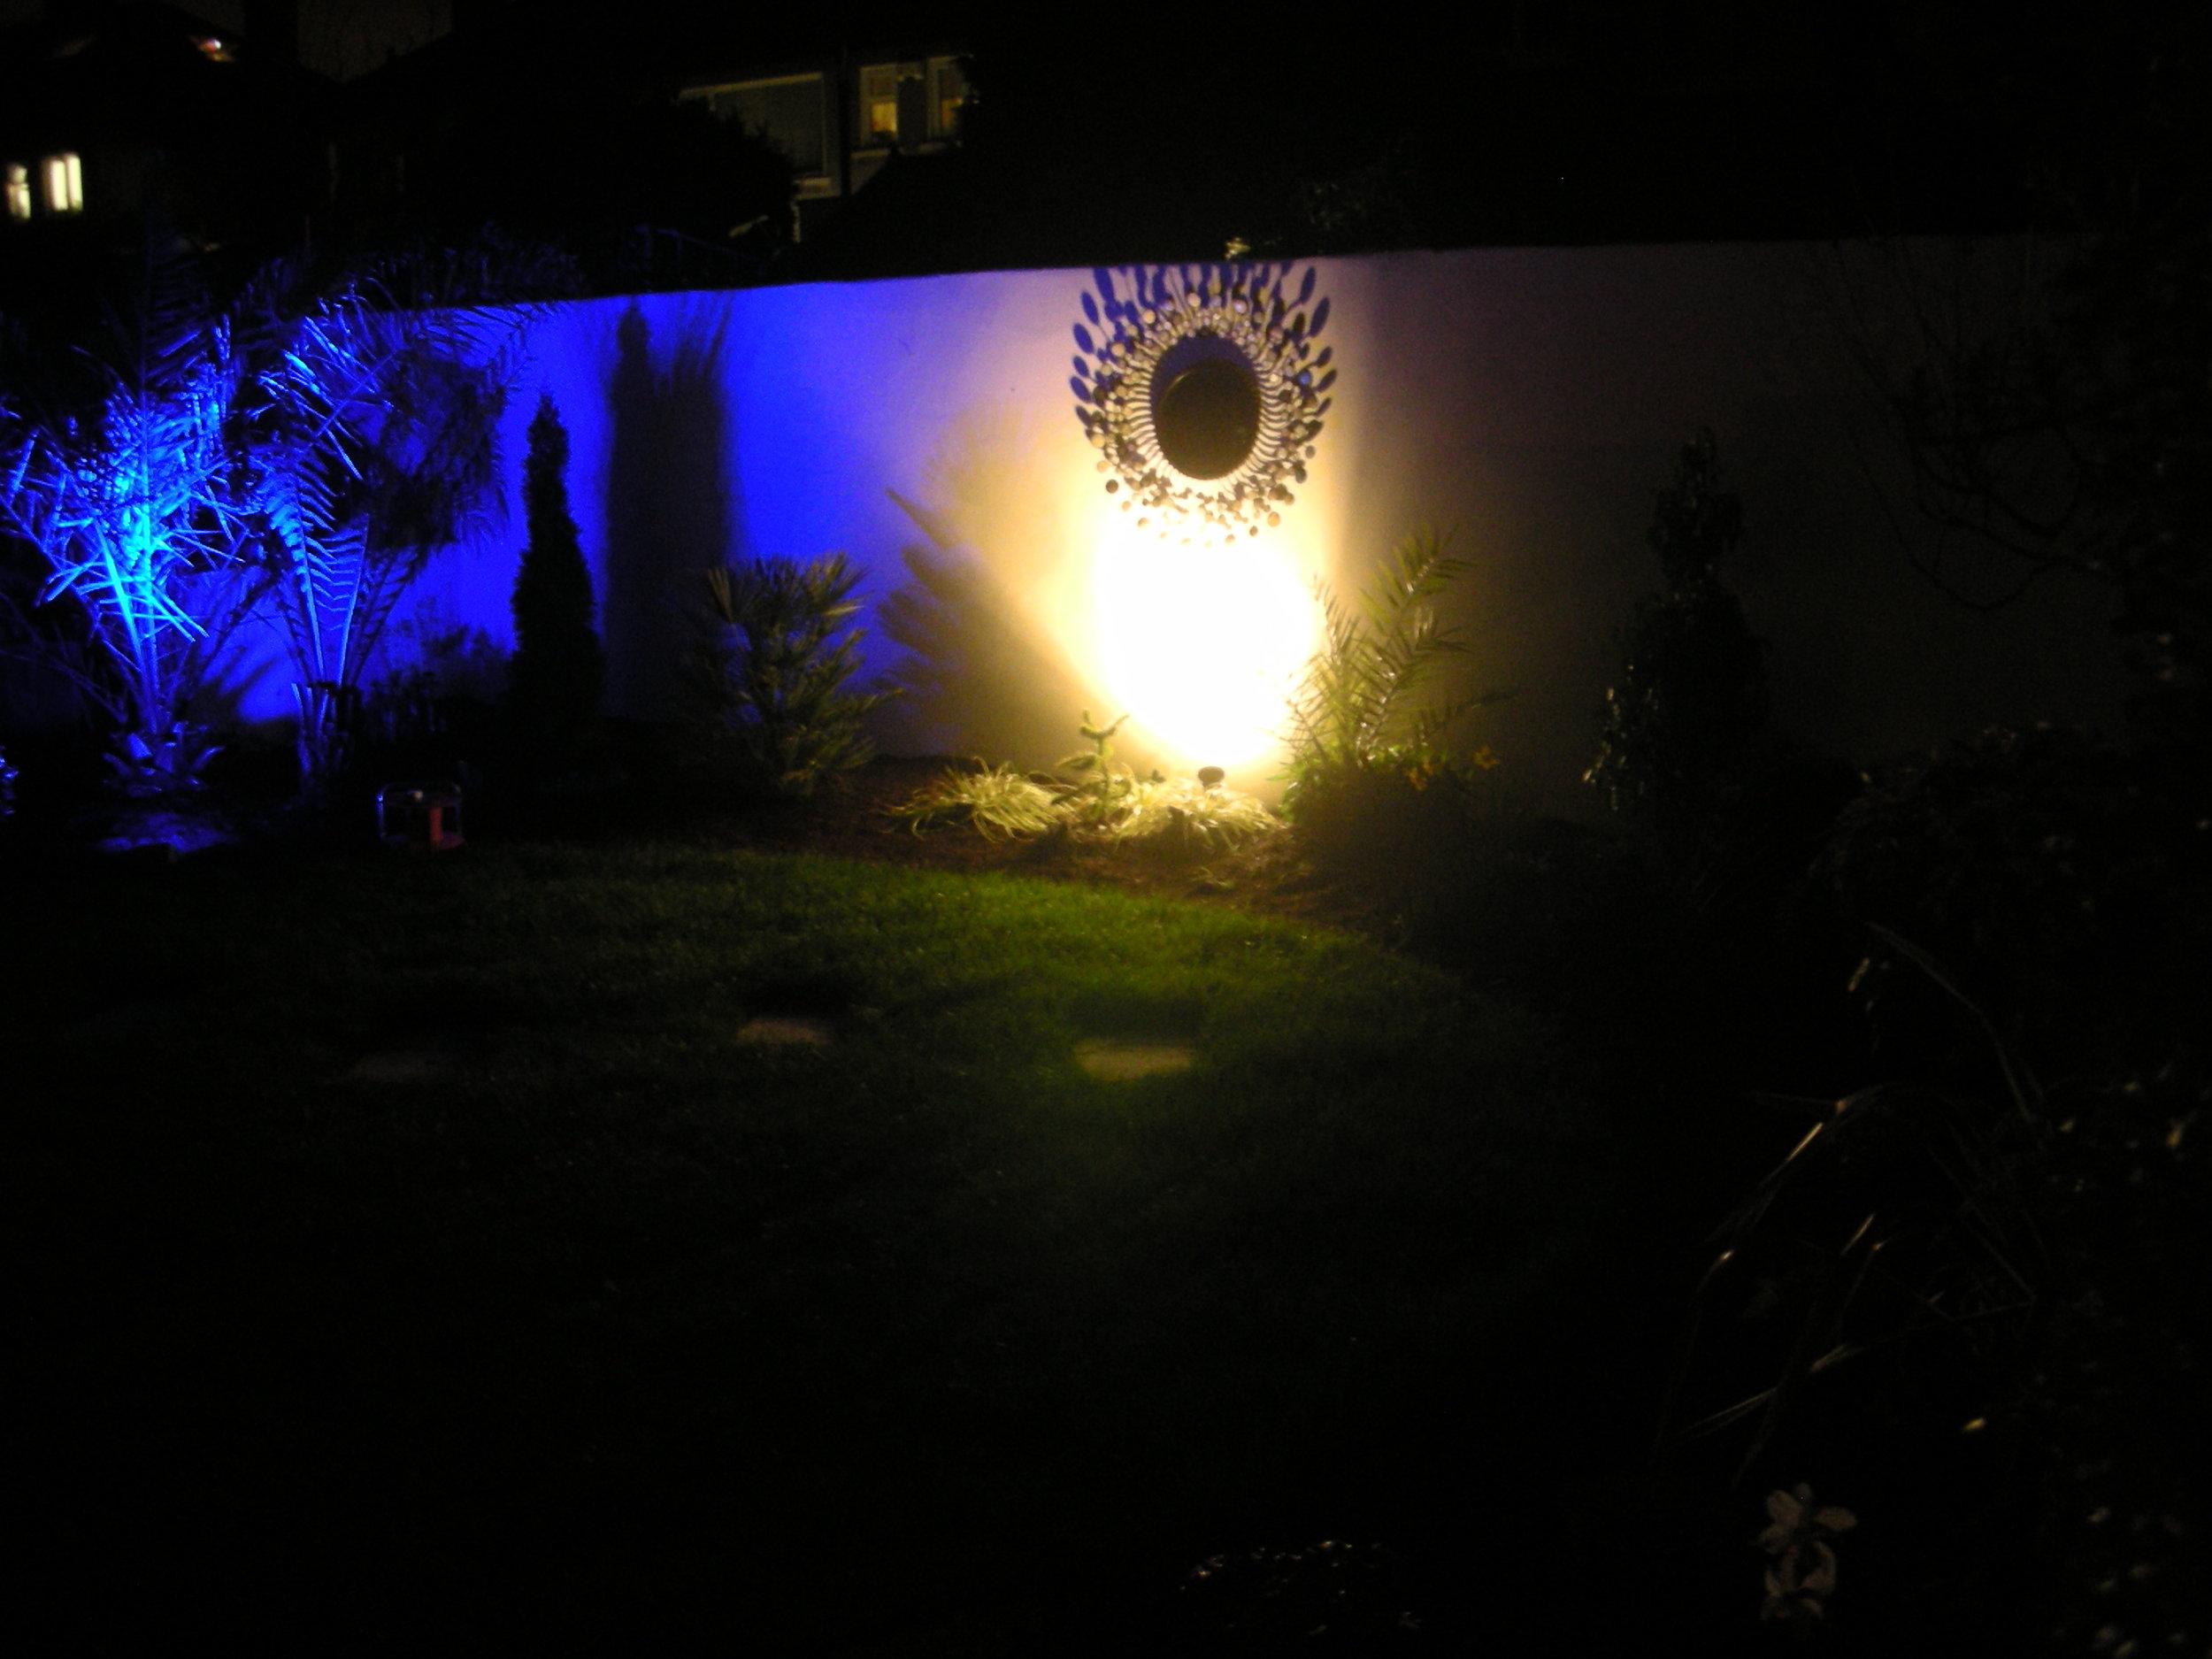 Back Garden mirror .JPG